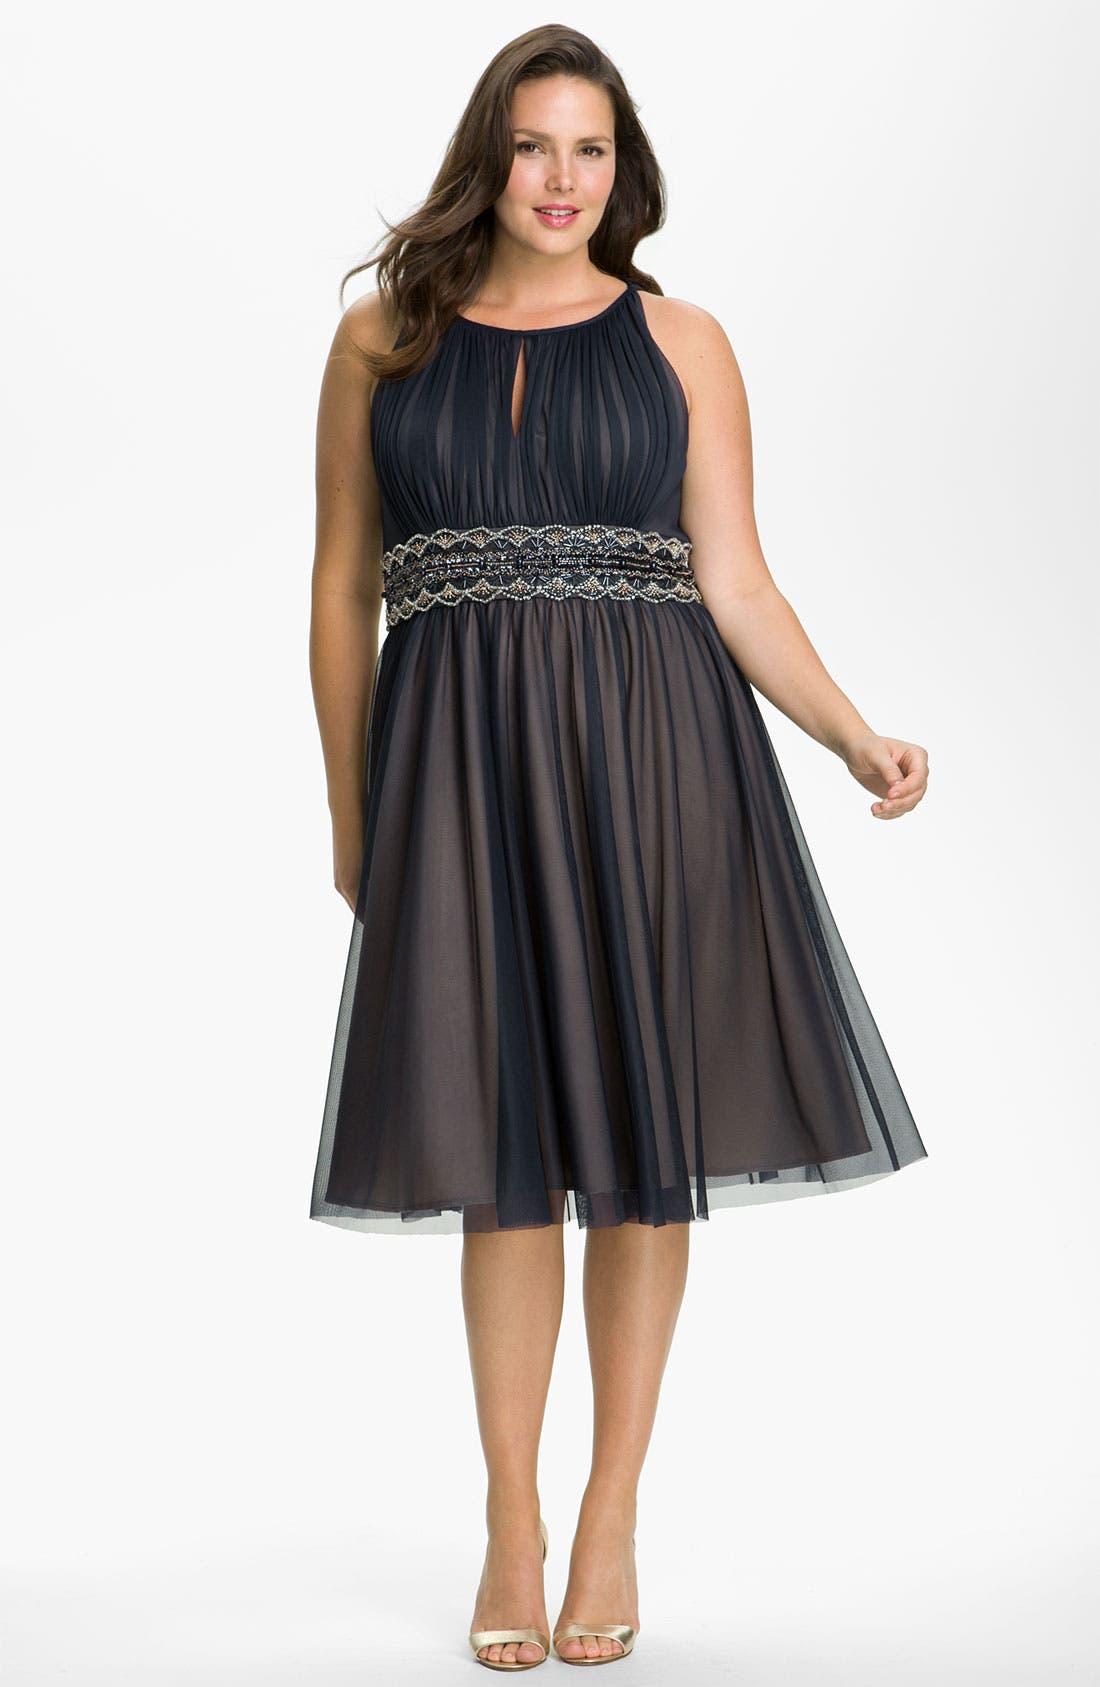 Alternate Image 1 Selected - JS Boutique Beaded Mesh Dress (Plus)